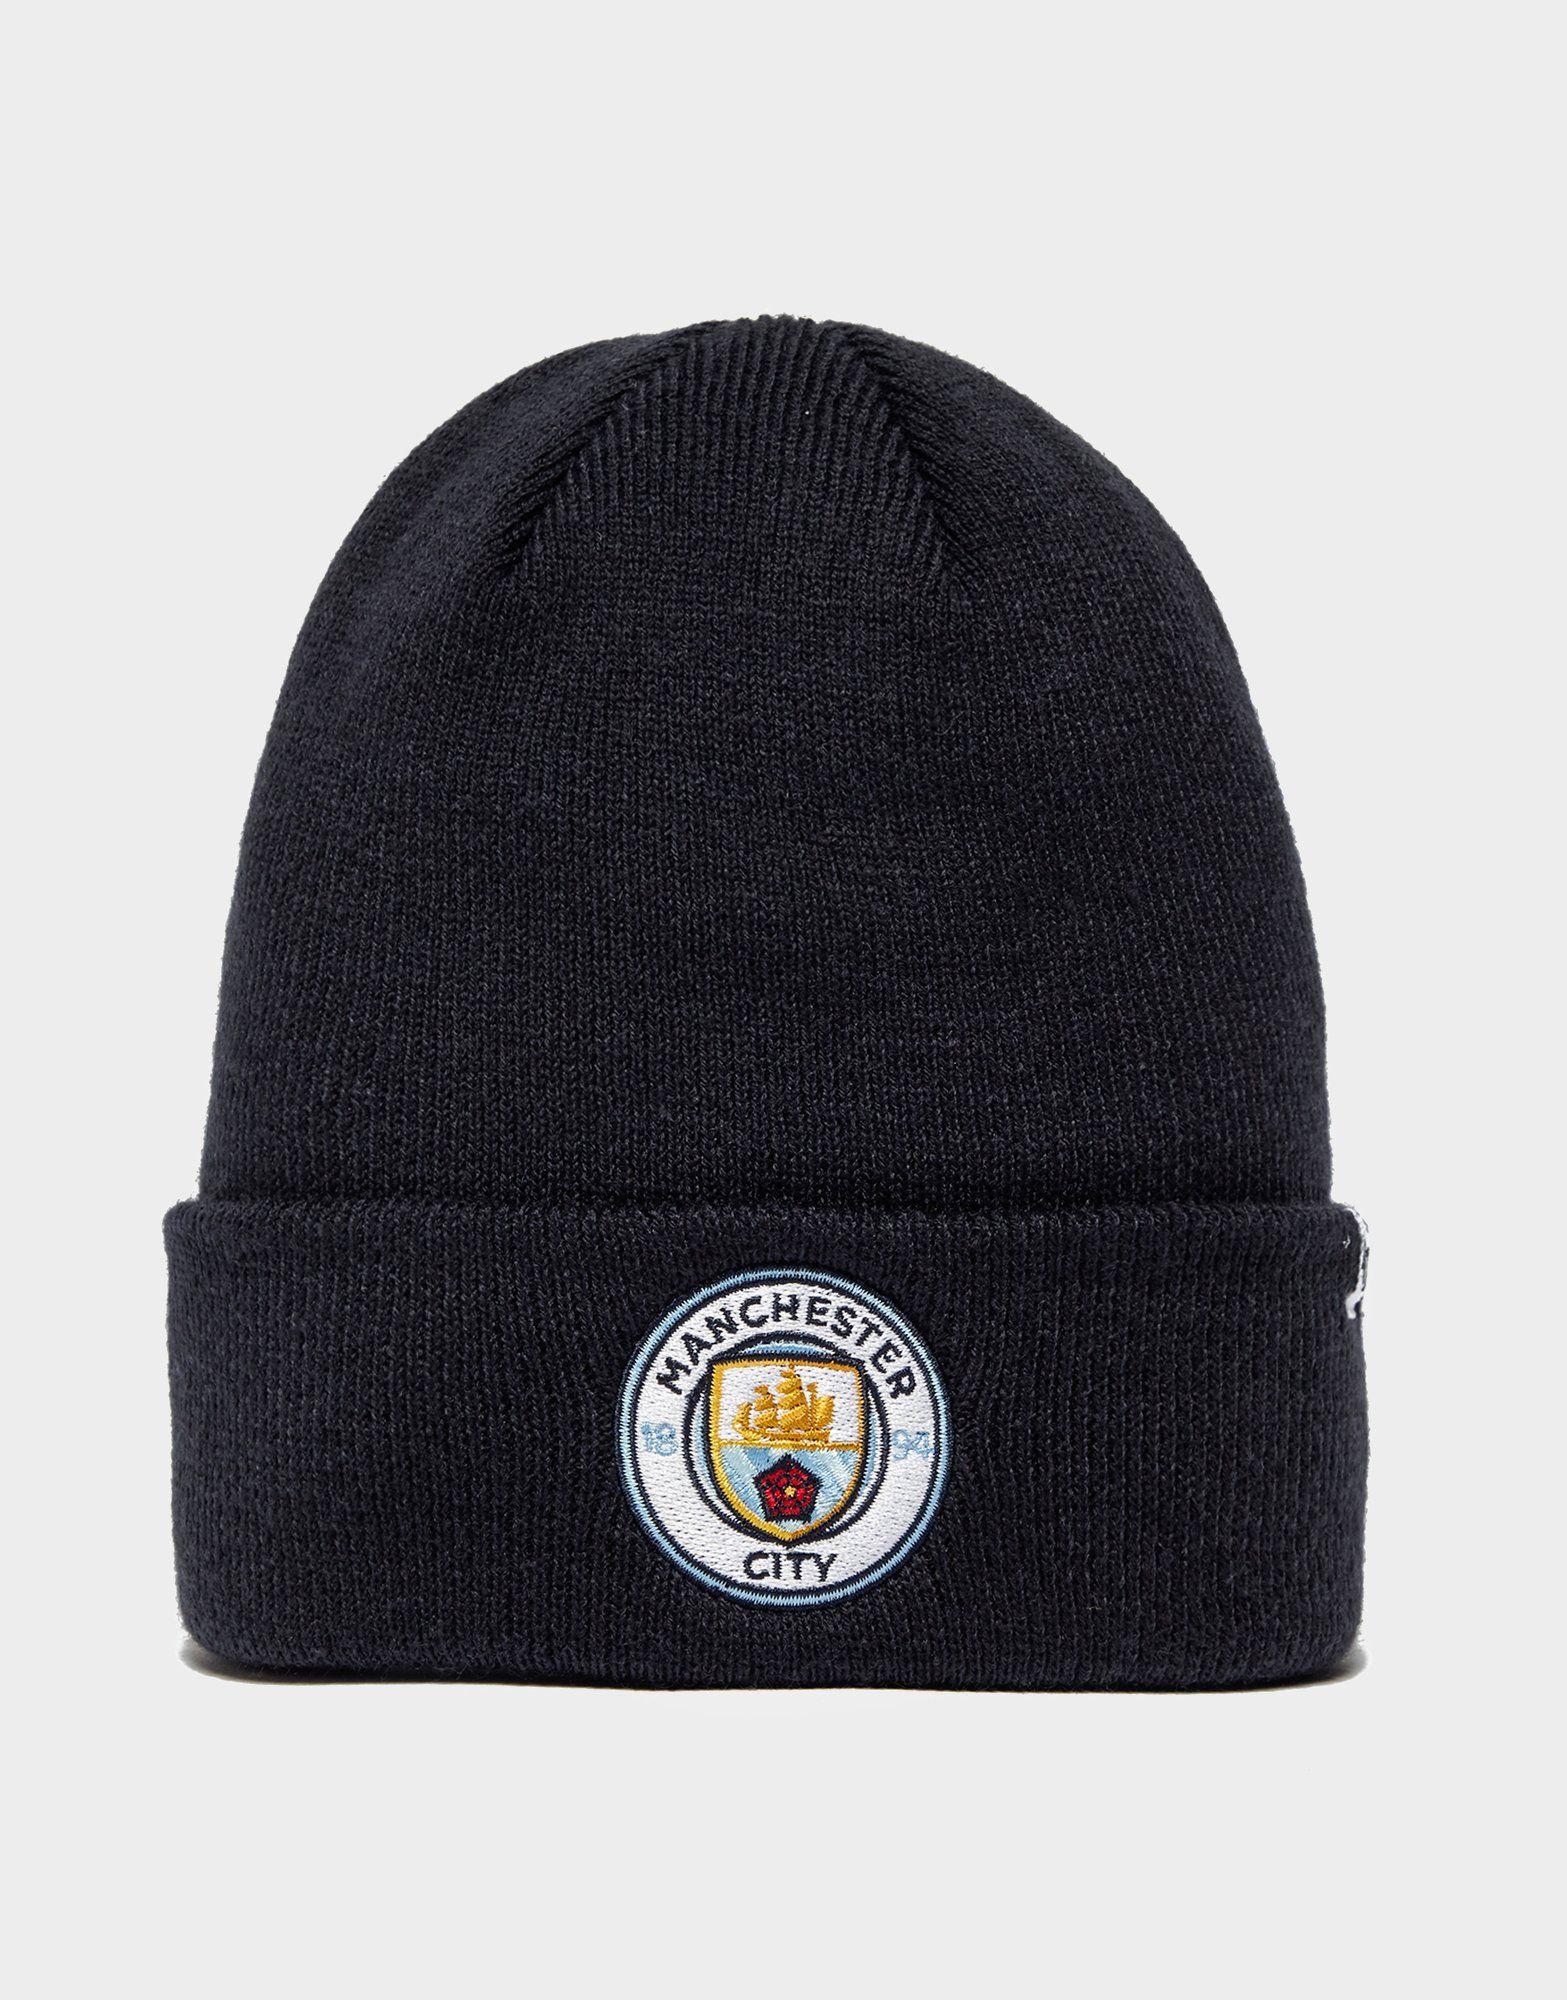 47 Brand Manchester City FC Cuffed Beanie Hat  fd4b9d3df03